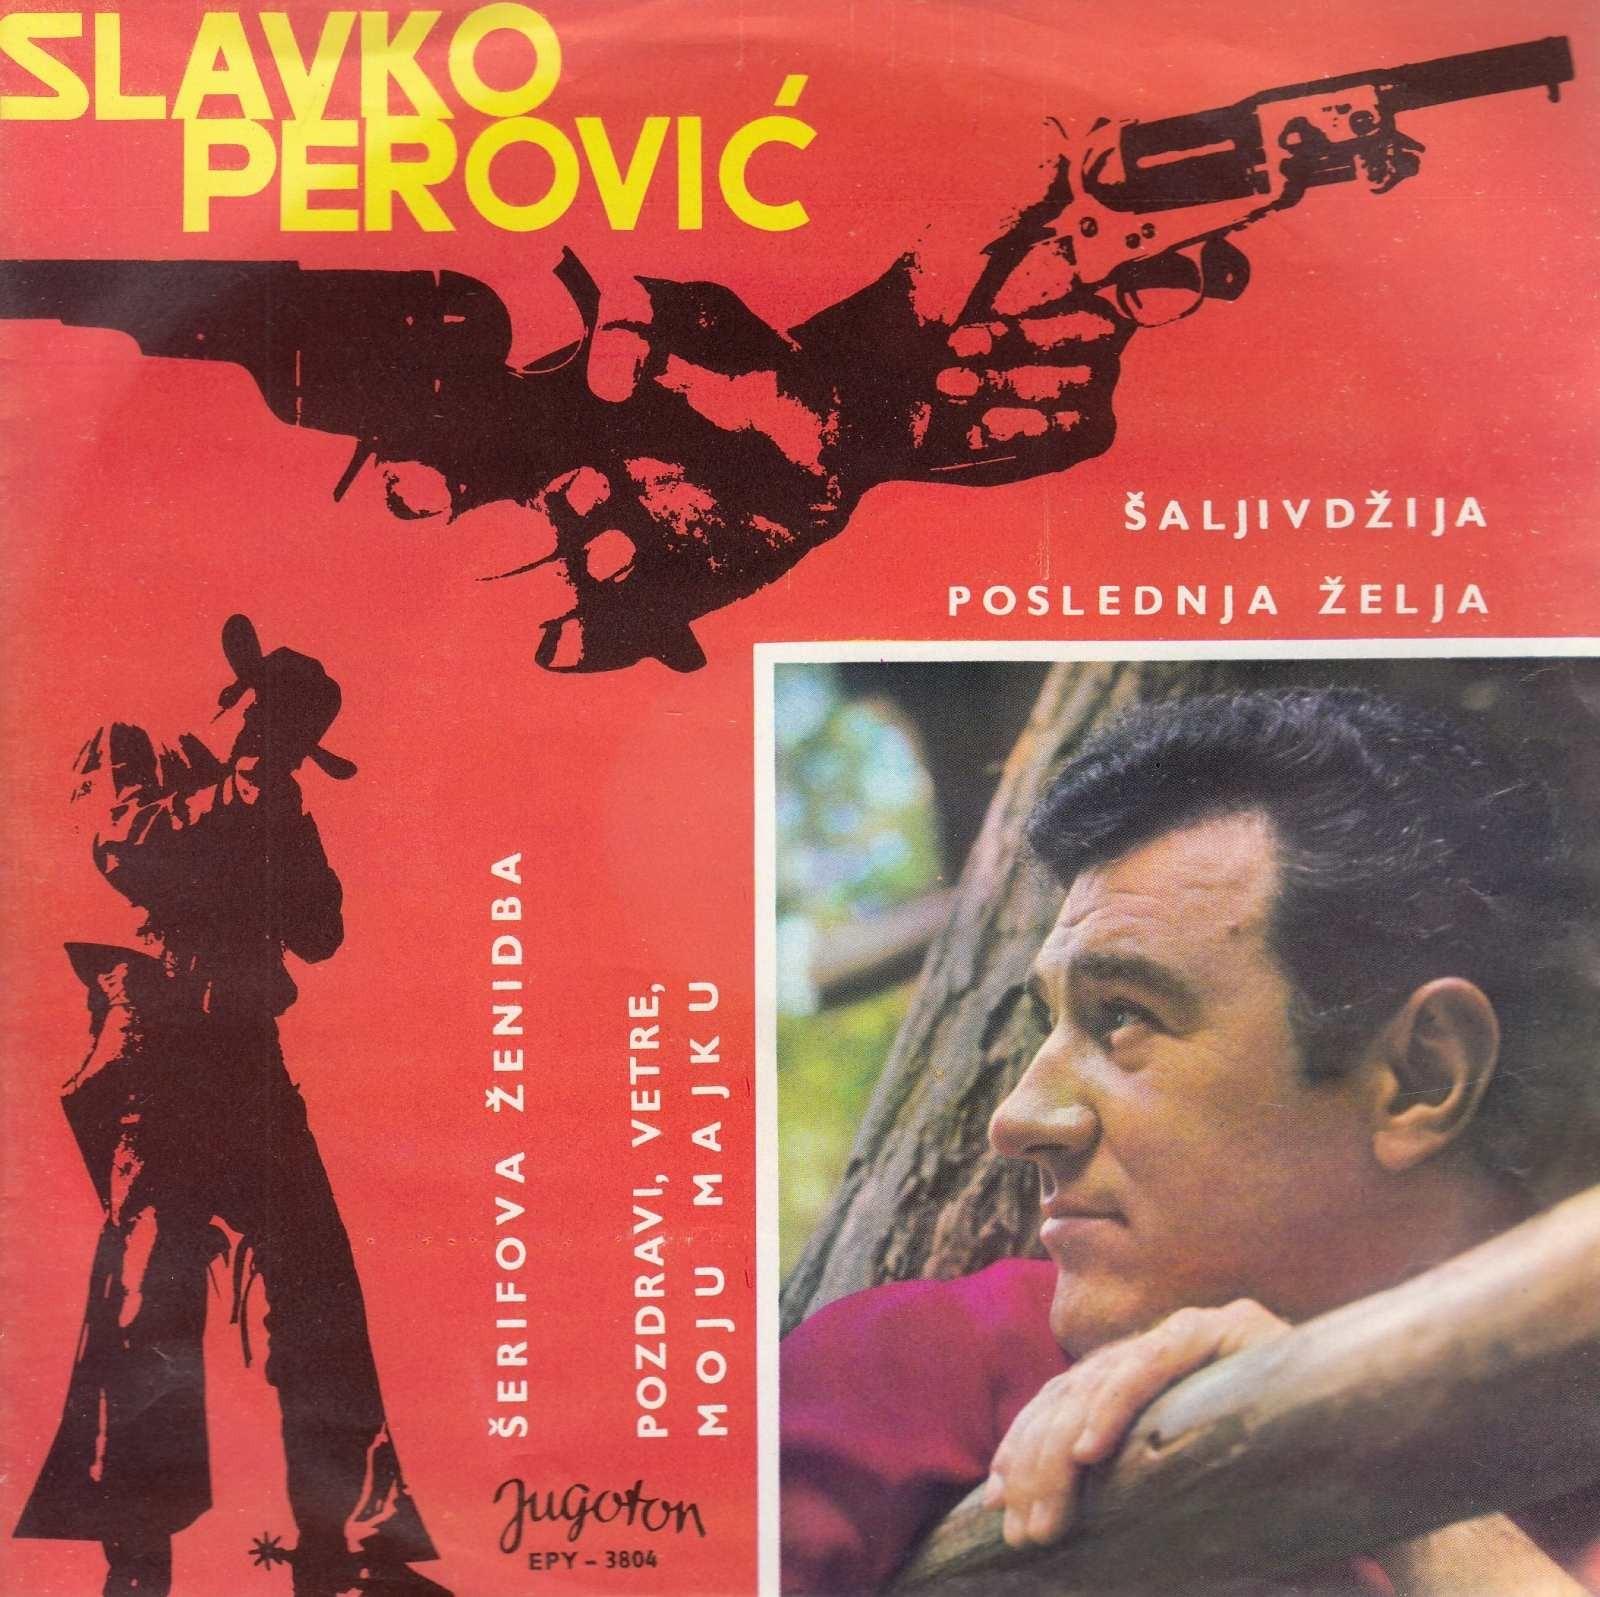 Perovic Slavko - Poslednja Zelja/saljivdzija/serifova Zenidba/pozdravi Vetre Moju Majku